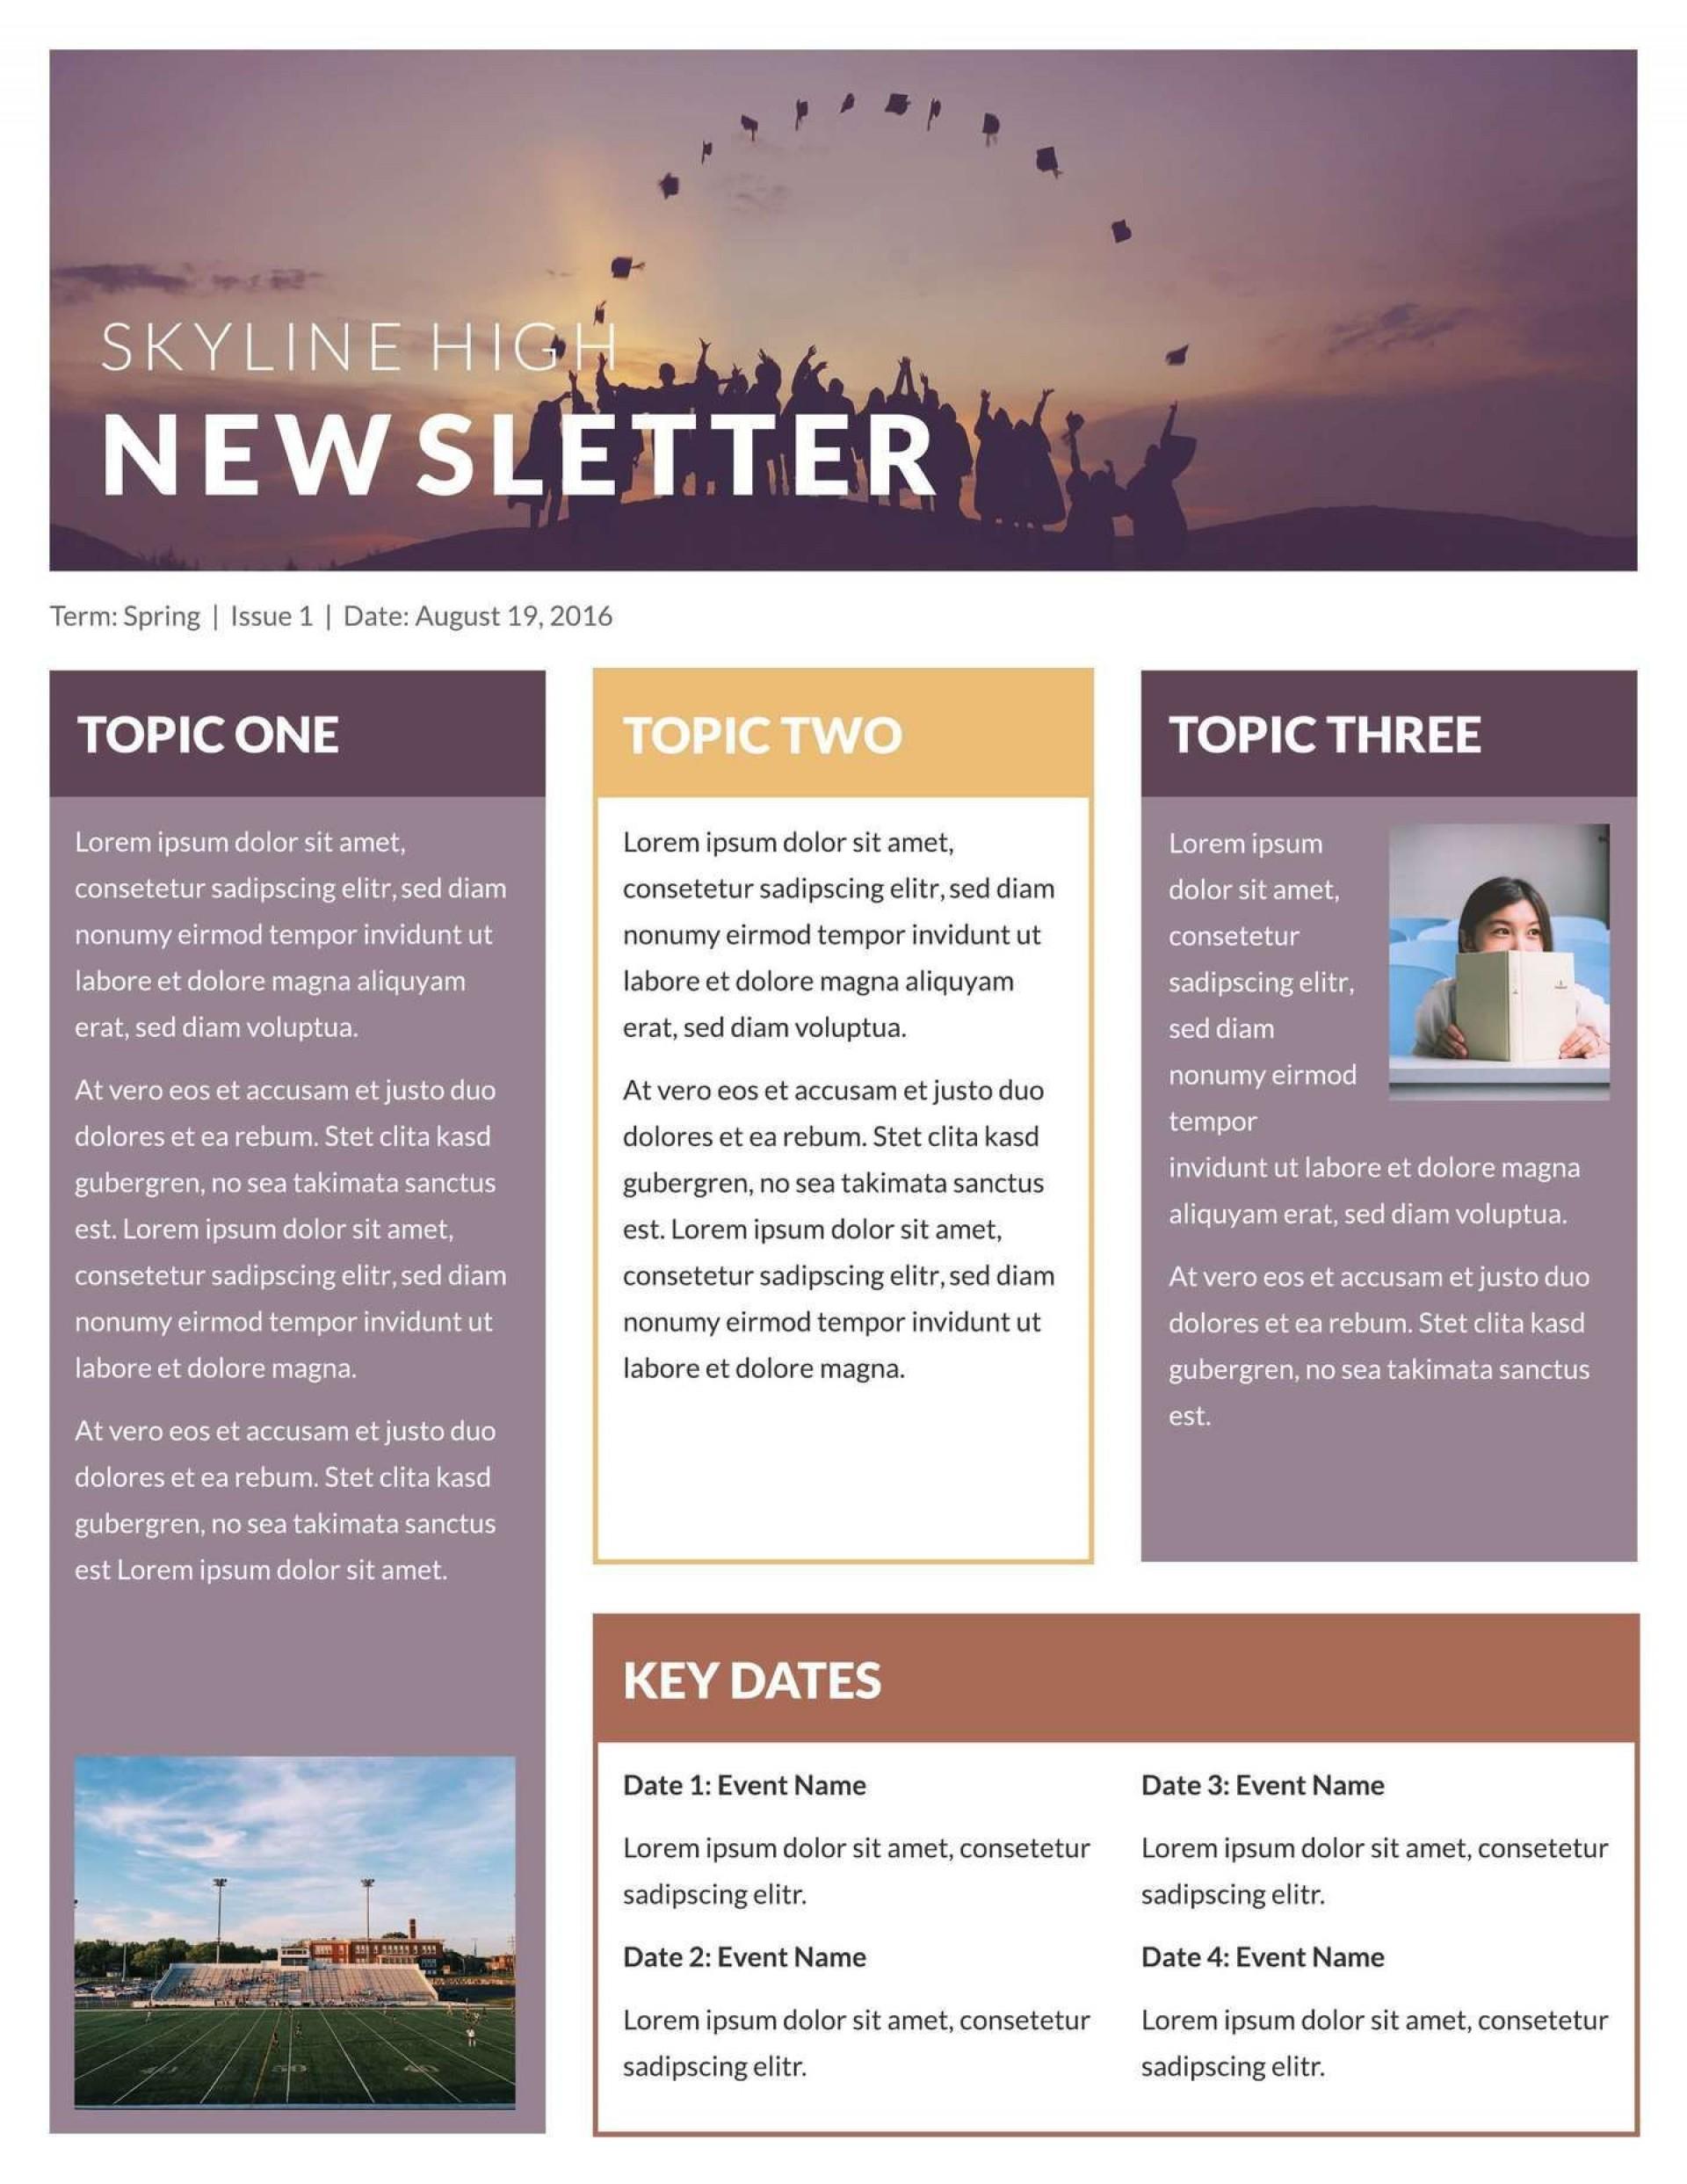 004 Singular Free Printable Newsletter Template High Def  Templates For Church Preschool1920